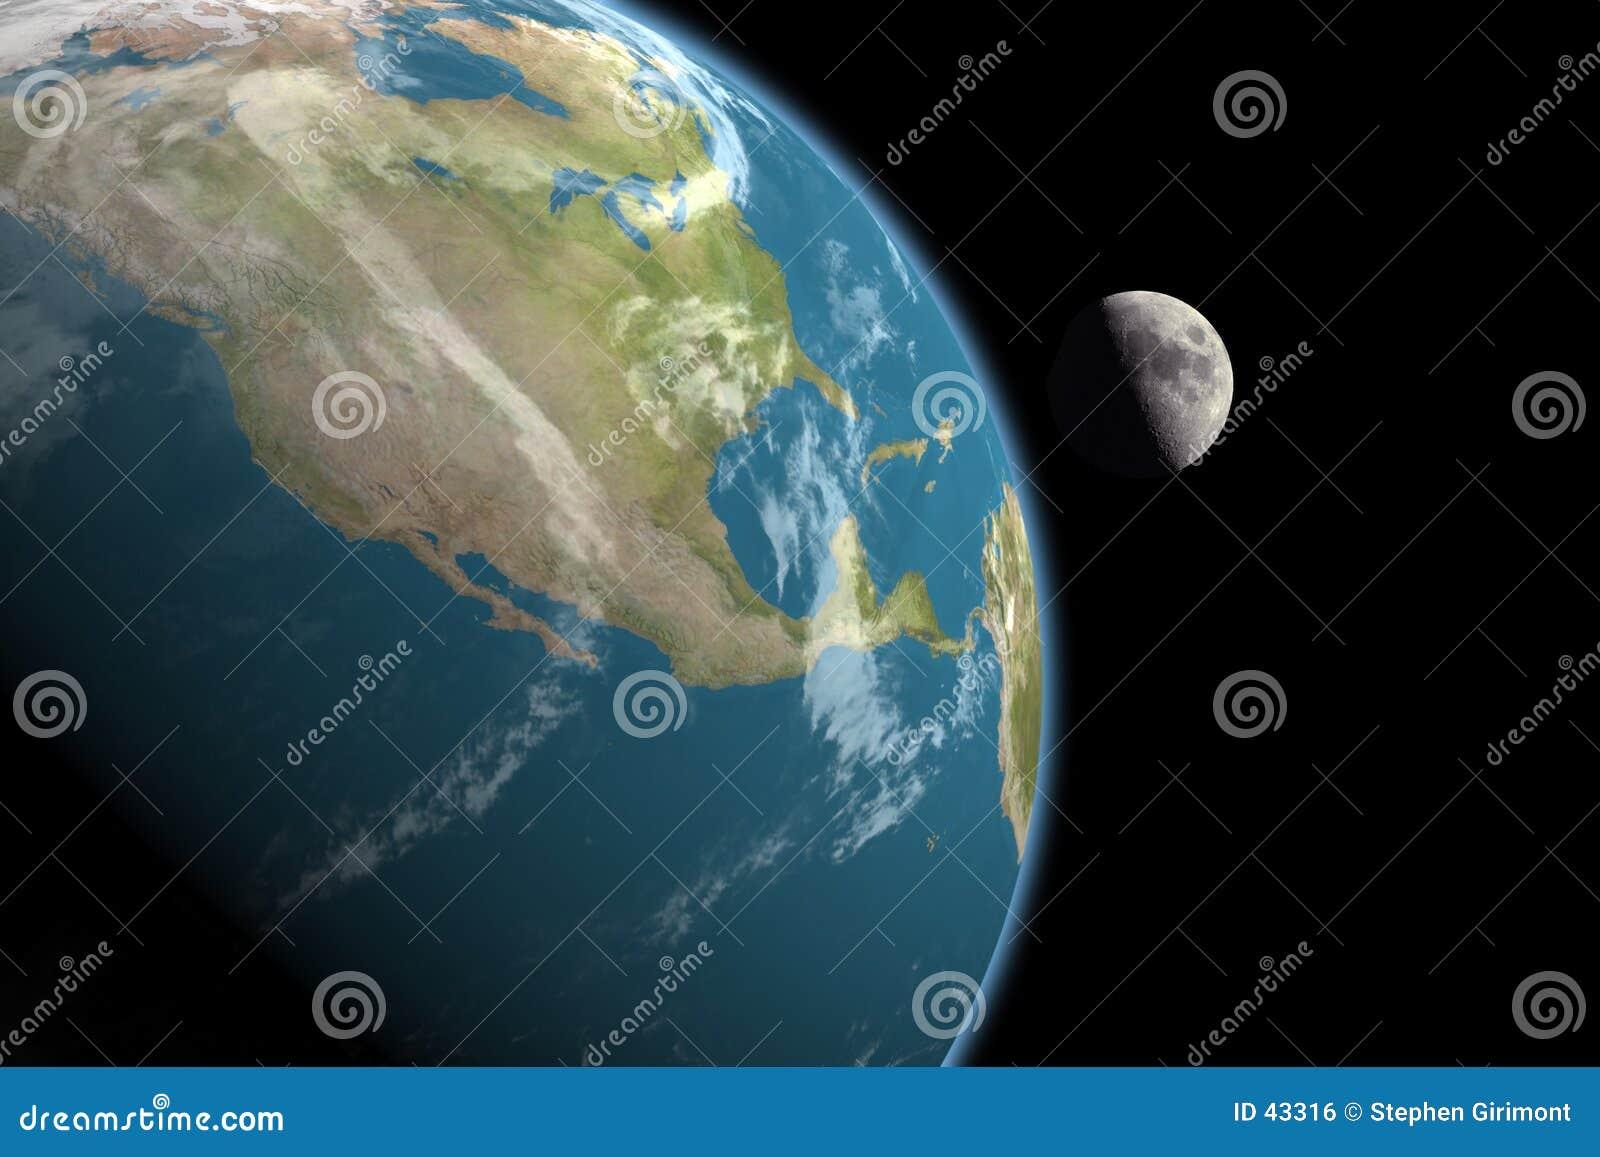 North America and Moon, No Stars